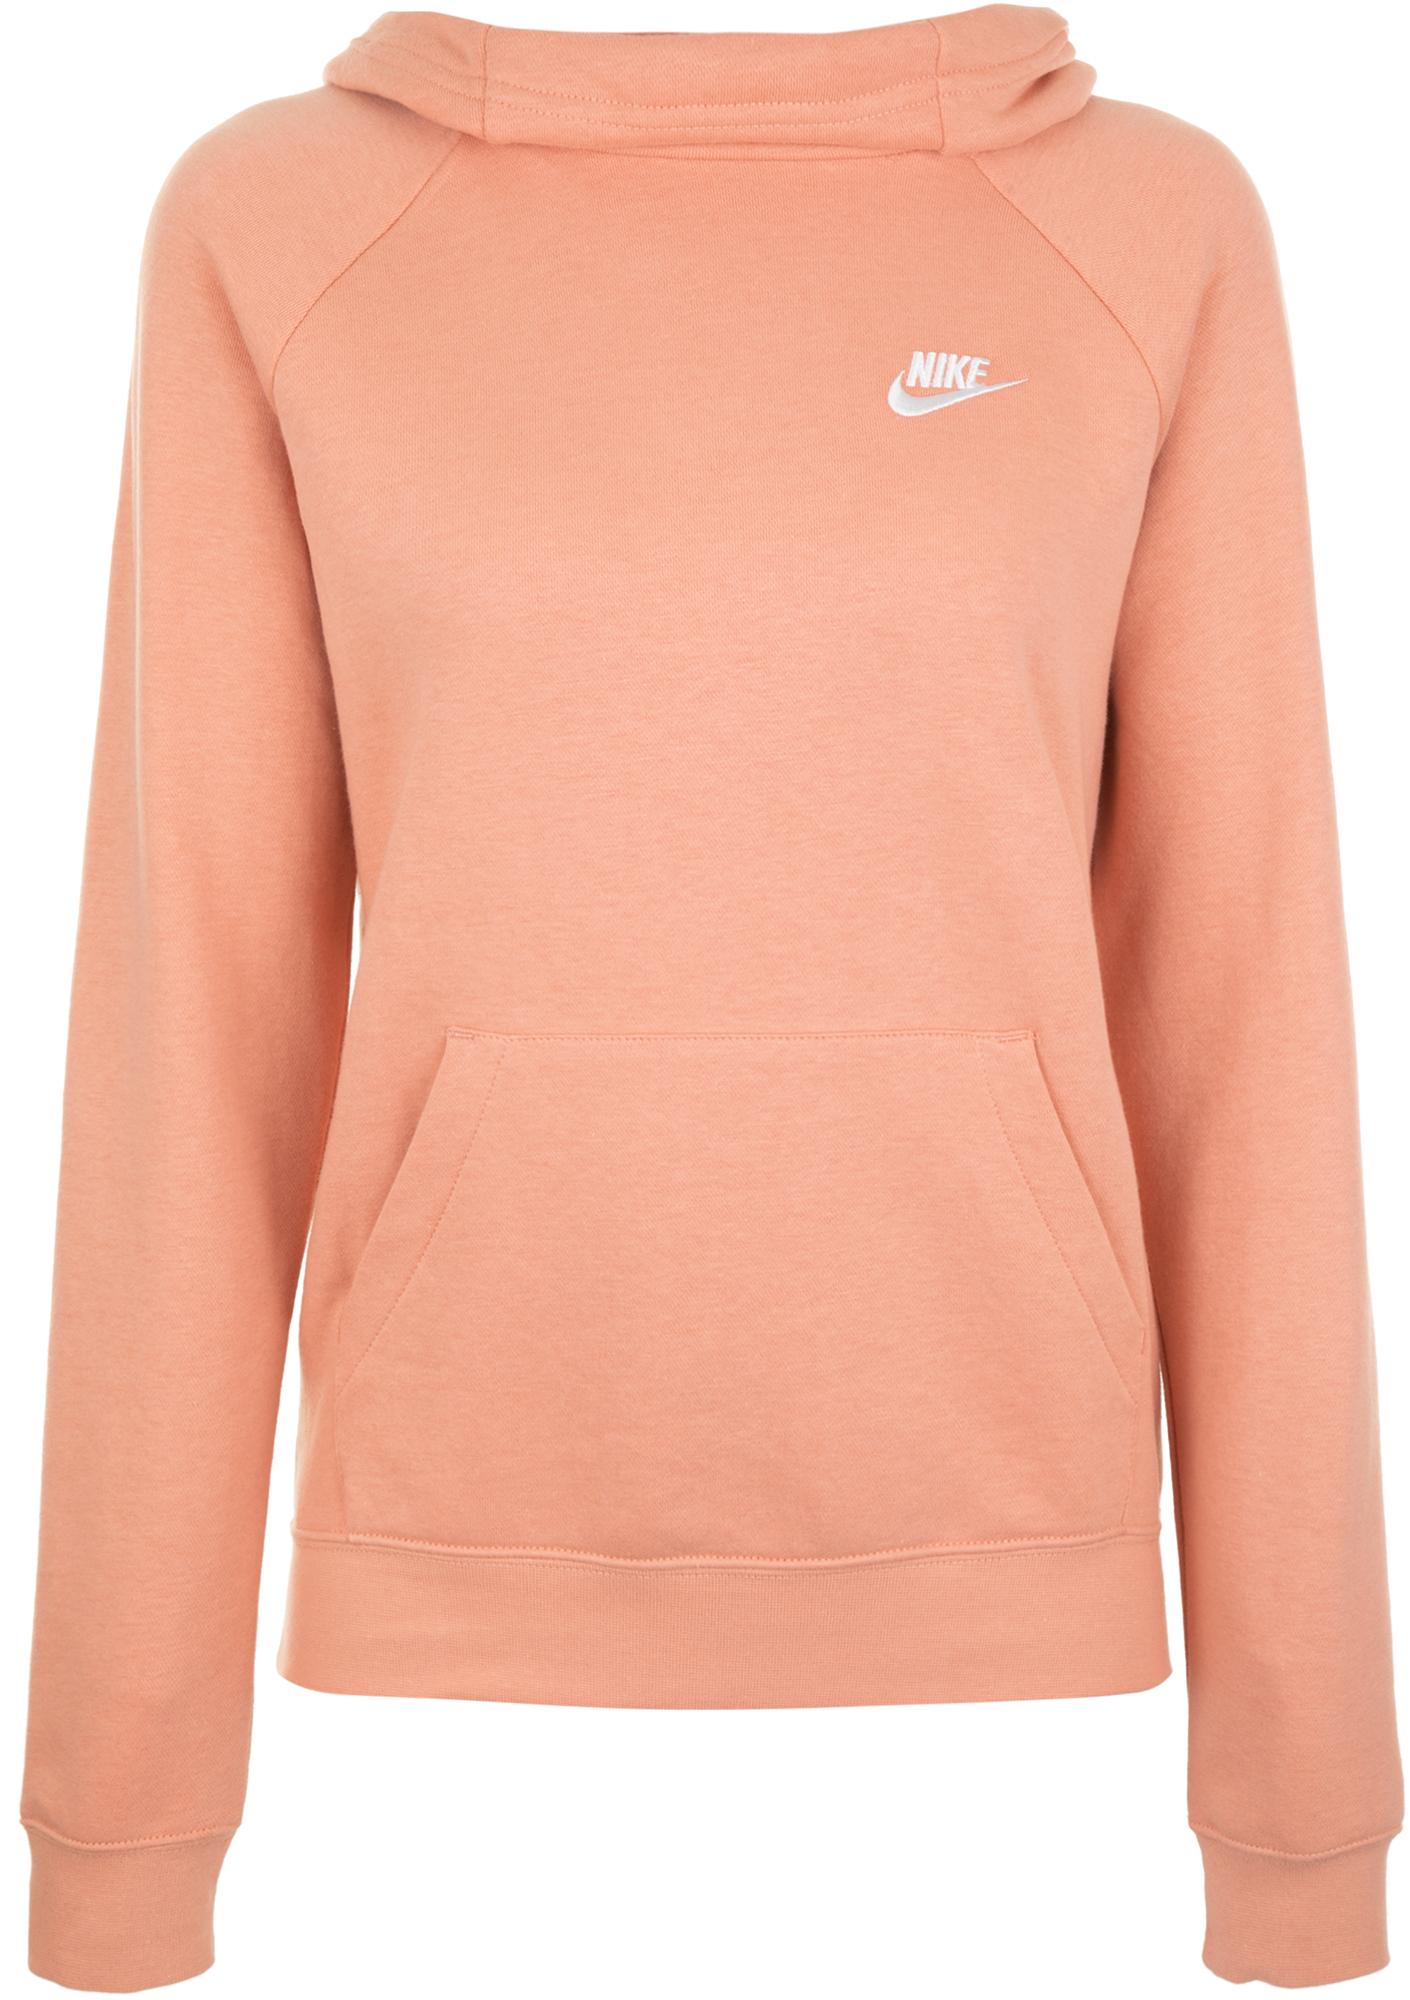 Nike Худи женская Nike Sportswear Essential, размер 48-50 nike майка женская nike размер 48 50